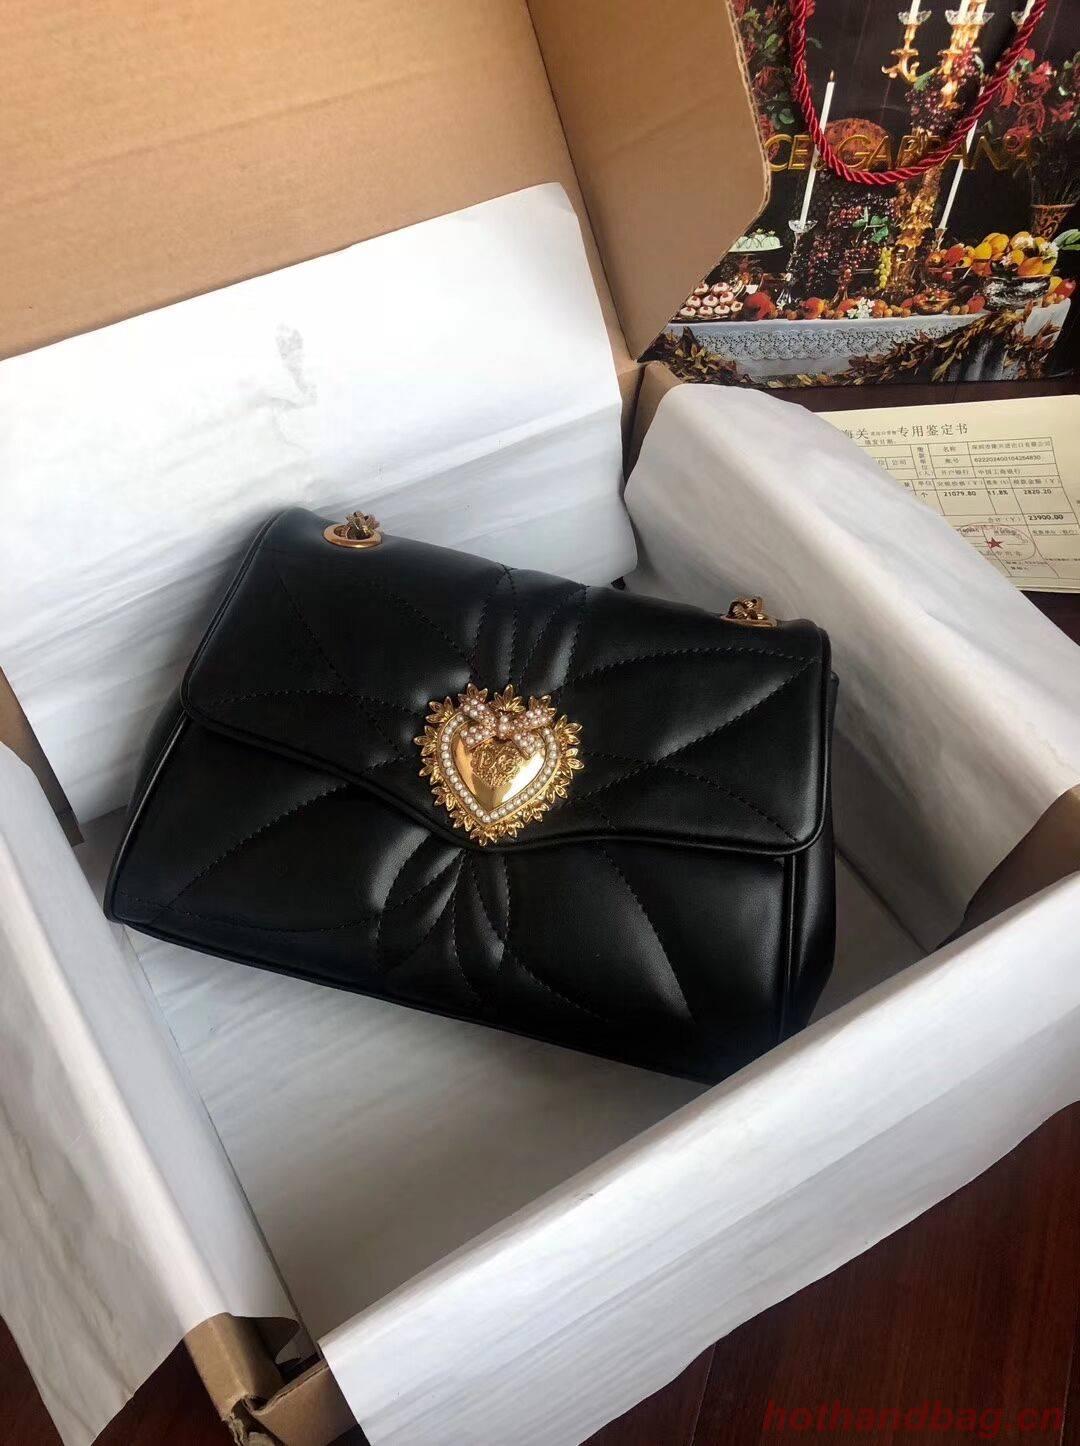 Dolce & Gabbana Origianl Leather Bag 4919 black